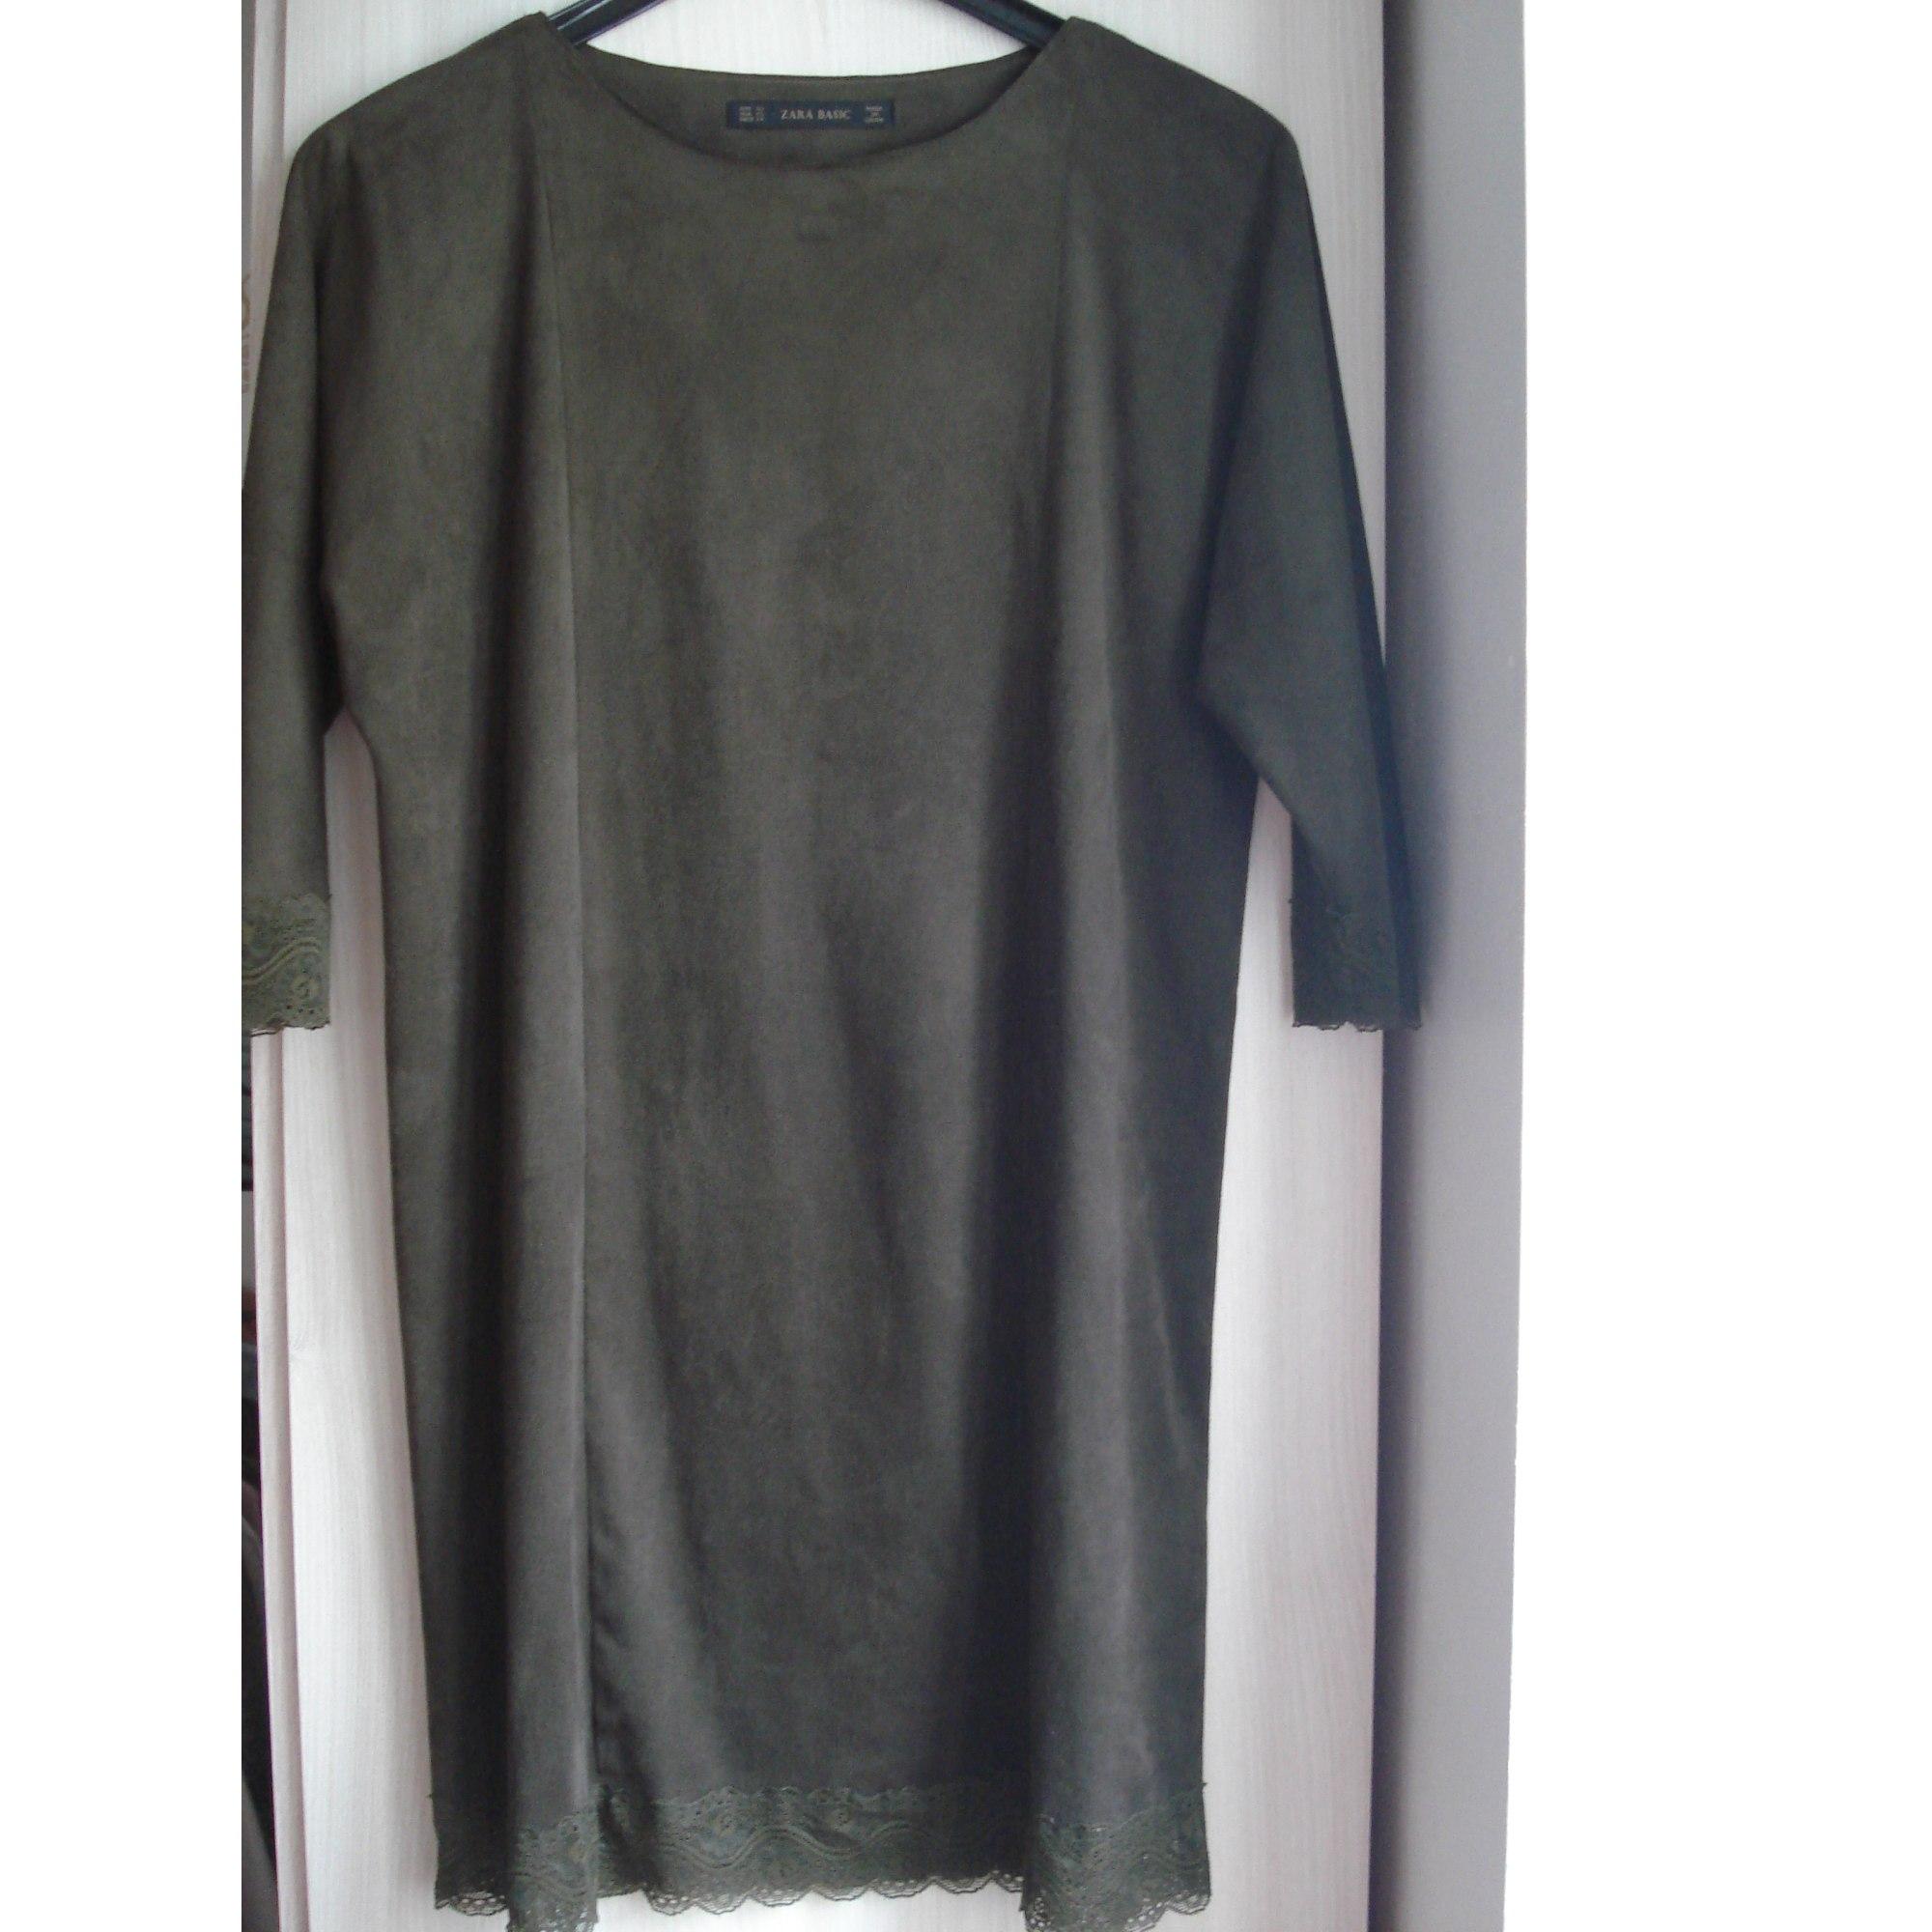 magasin d'usine 0ea83 f6588 Robe mi-longue